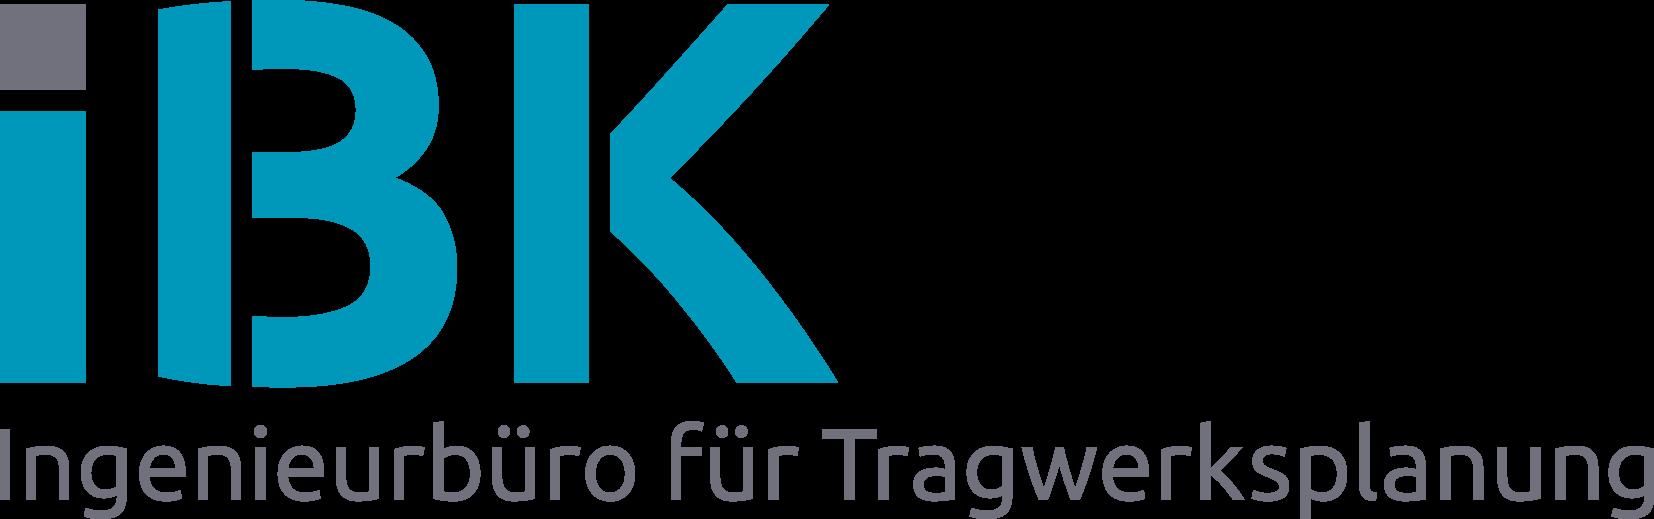 IBK Ingenieurbüro für Tragwerksplanung